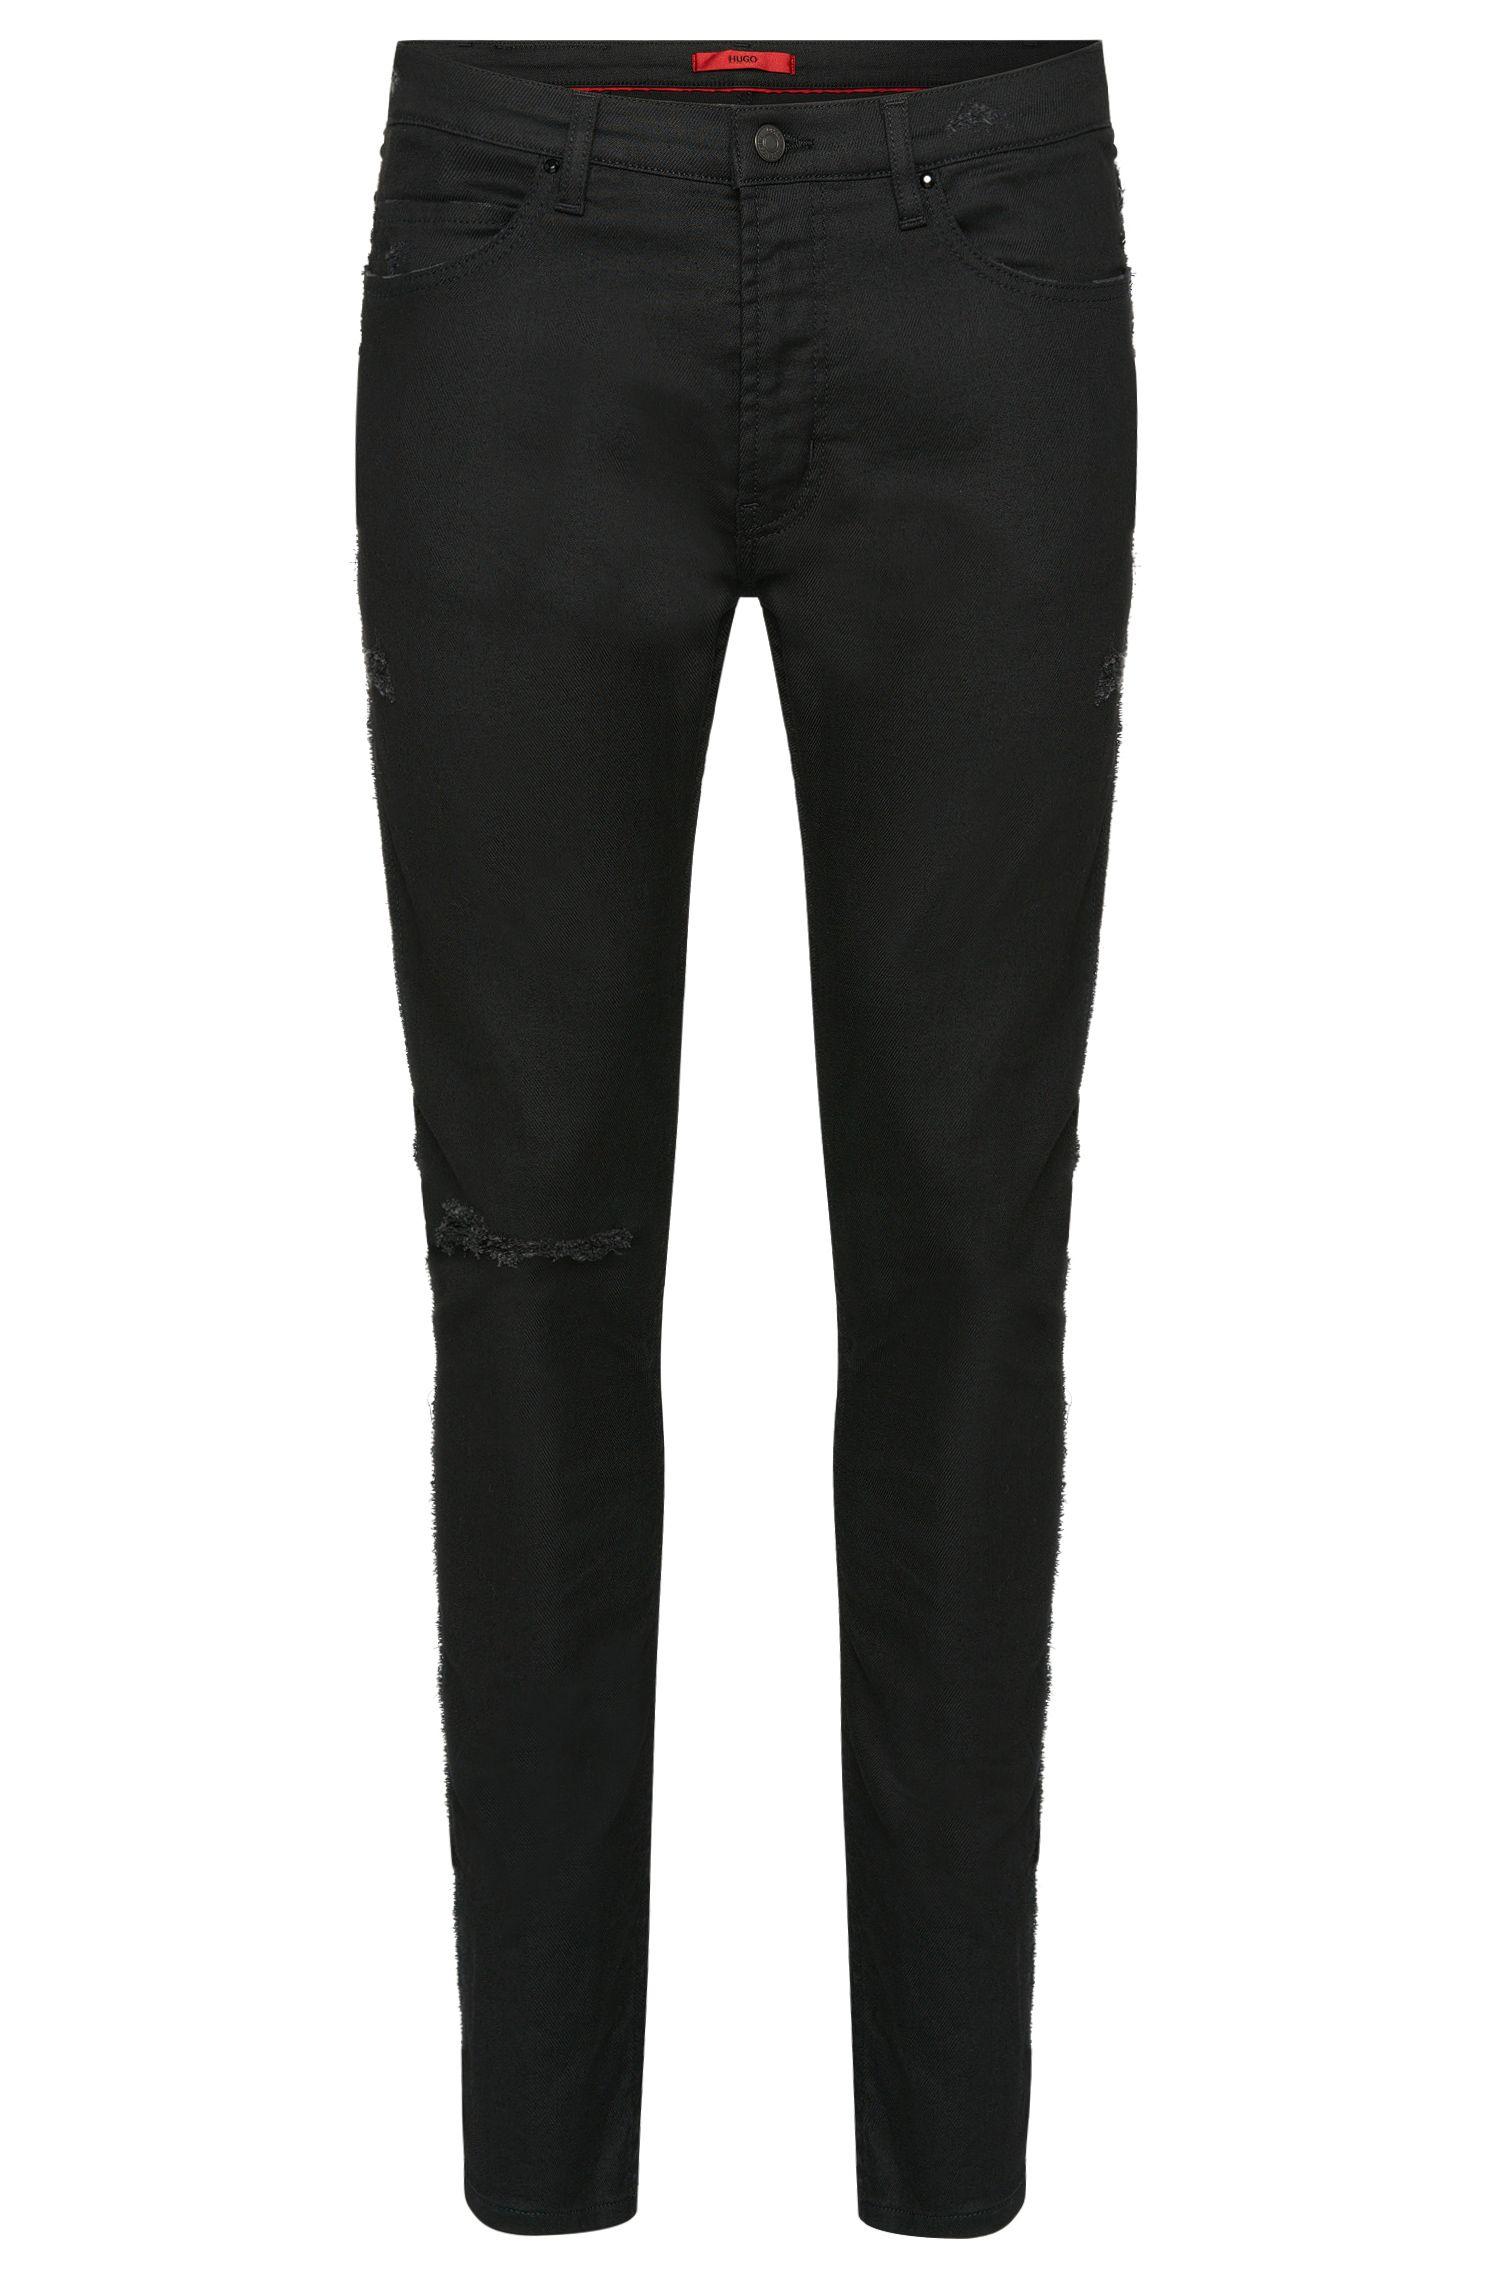 10 oz Stretch Cotton Blend Jeans, Skinny Fit | Hugo 734